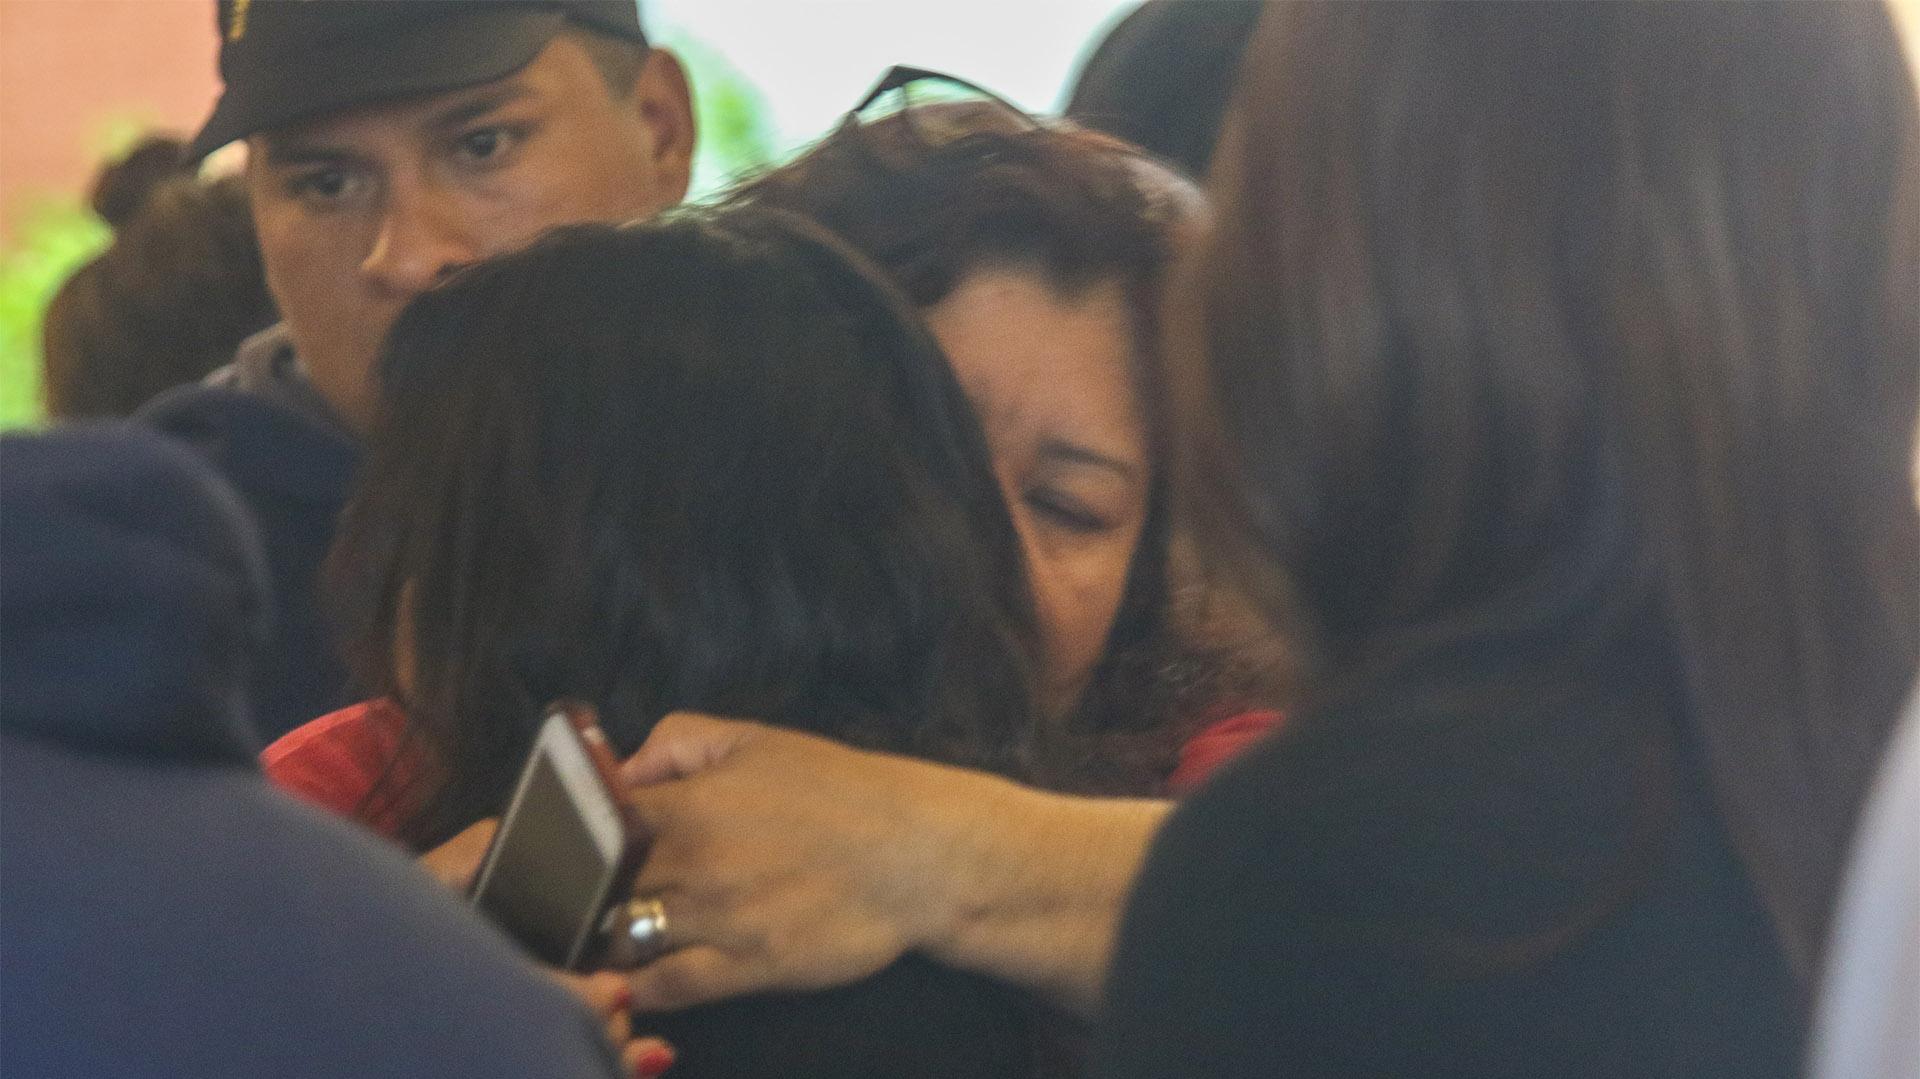 El dolor de los familiares de los tripulantes del ARA San Juan (Christian Heit)